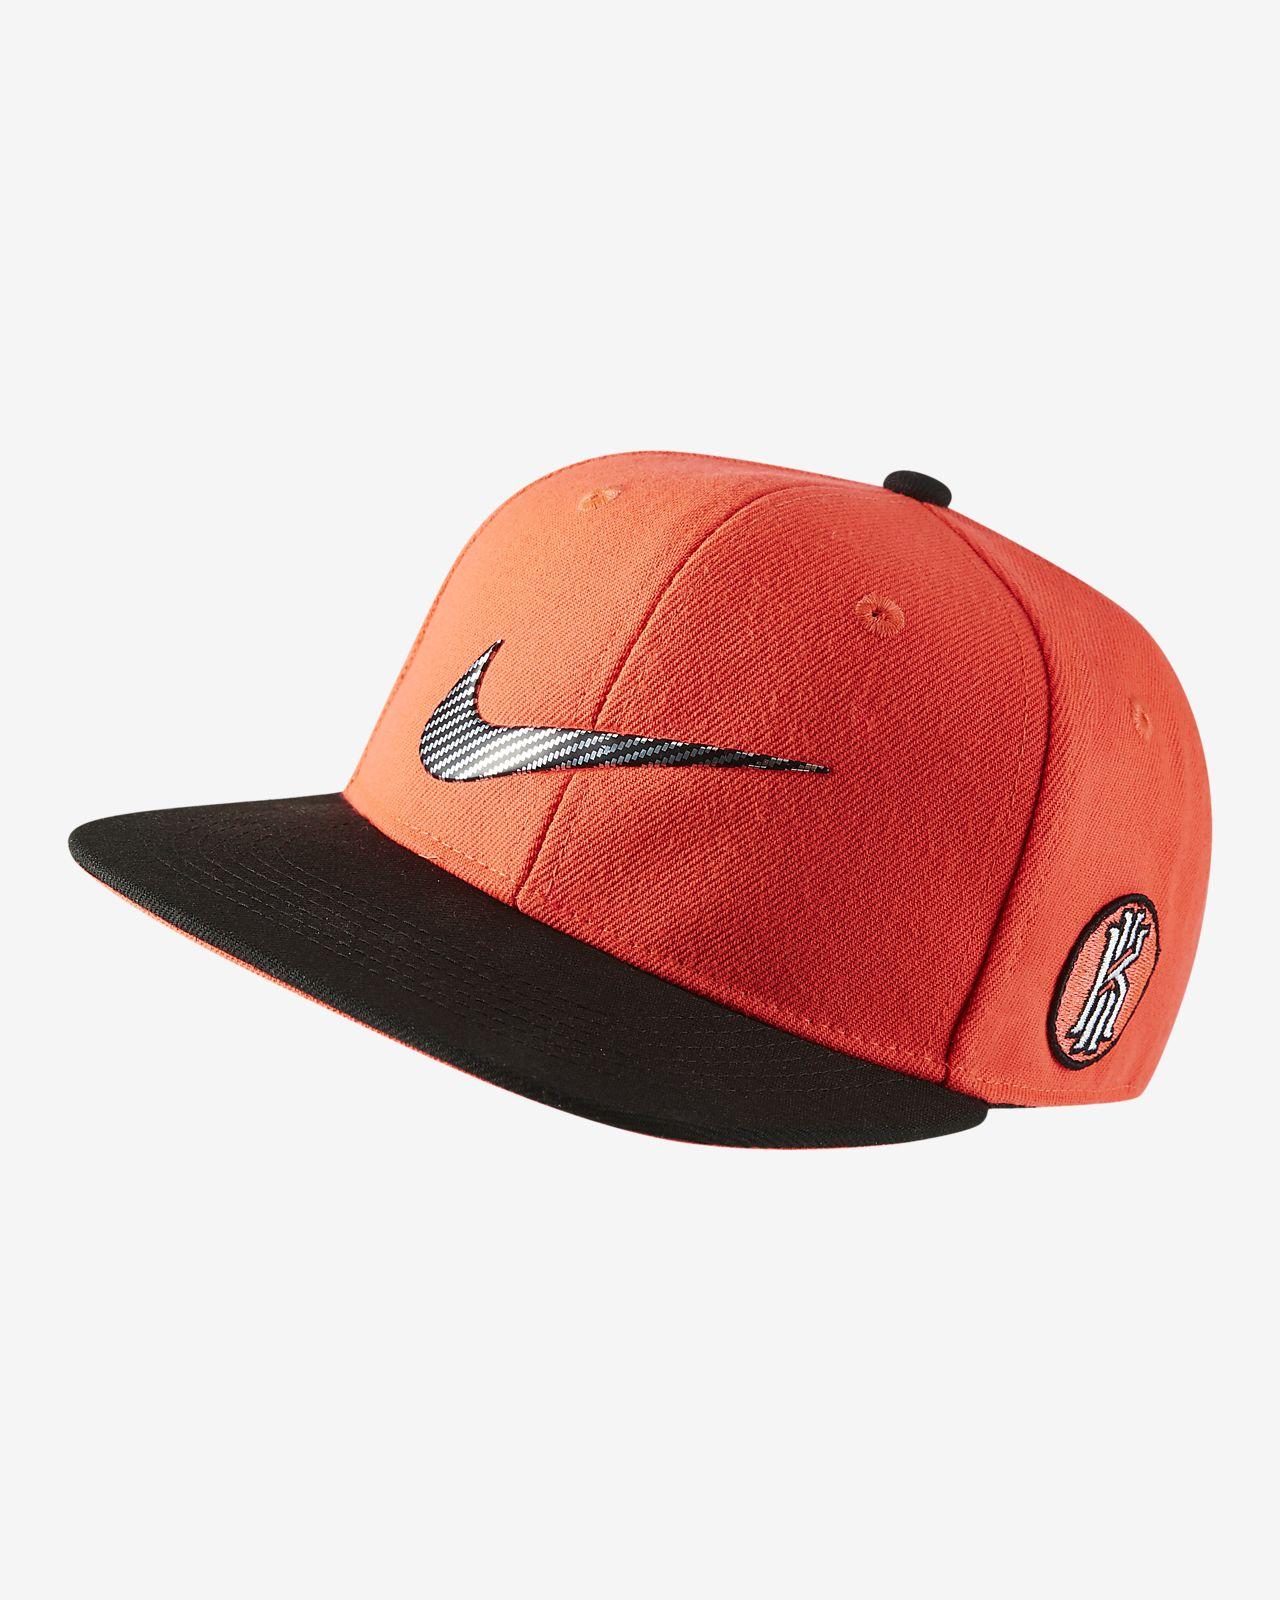 Cappello regolabile Nike - Bambini